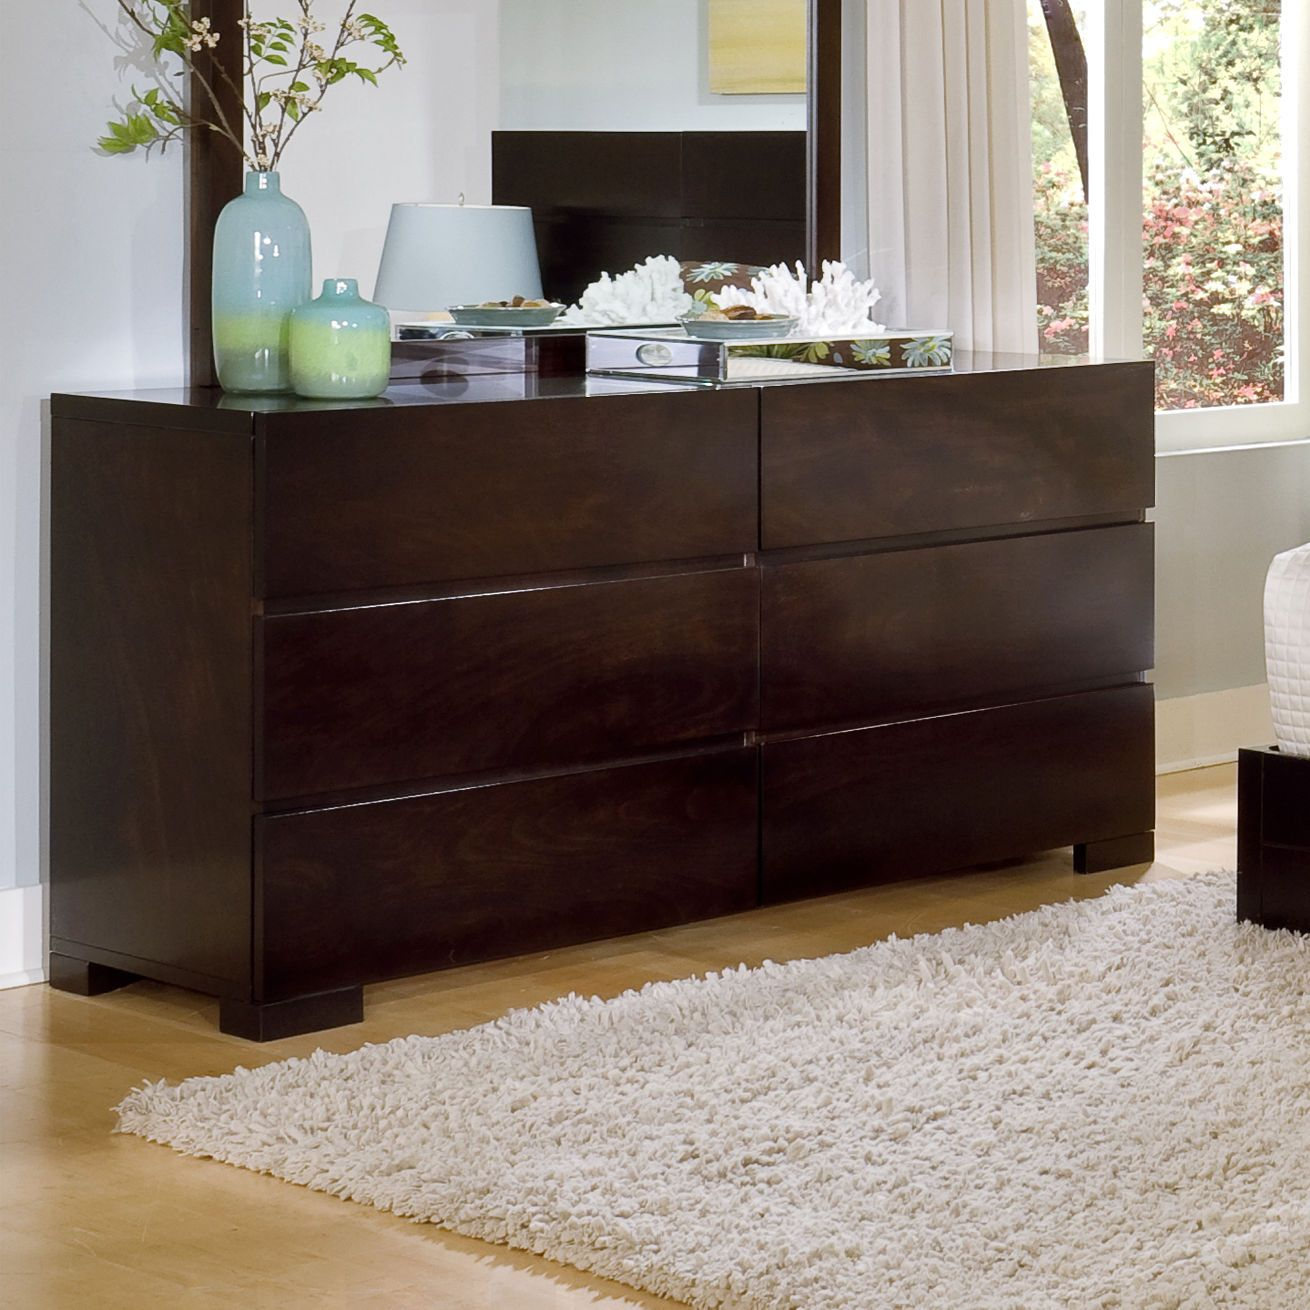 Bedroom Ligna Furniture Cypress 6 Drawer Dresser In Walnut Wayfair 950 Six Drawer Dresser Ligna Furniture Dresser [ 1310 x 1310 Pixel ]